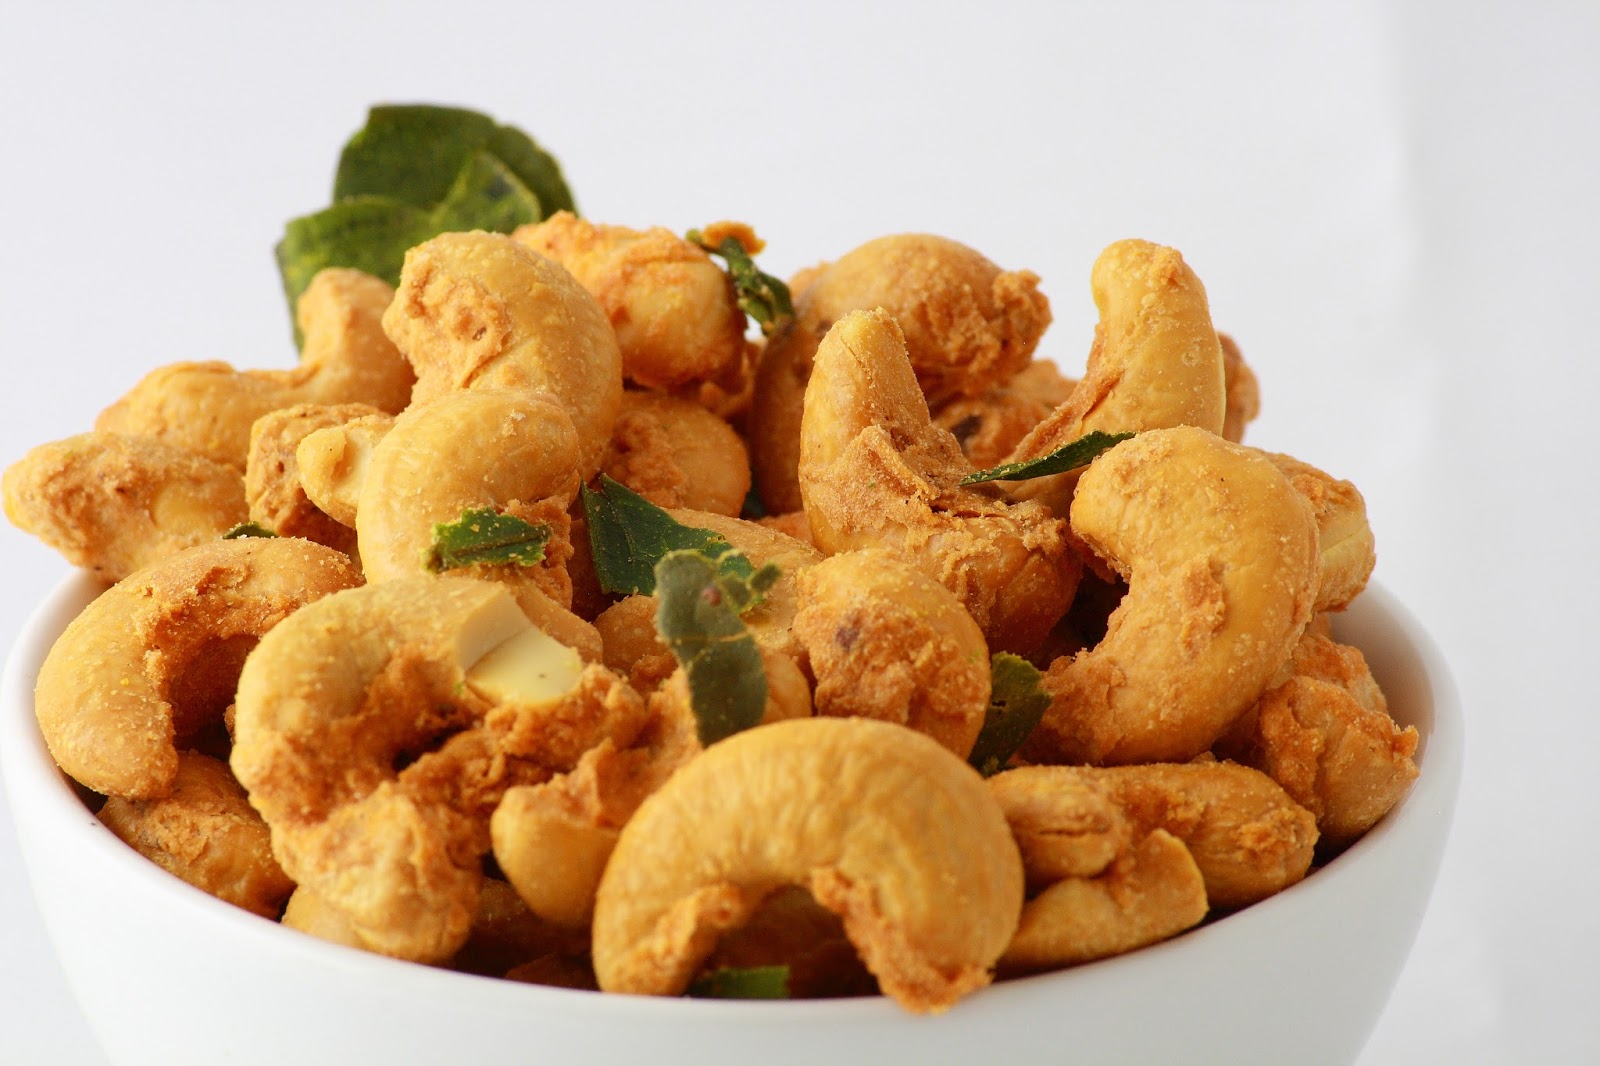 Manfaat Kacang Mede Bagi Kesehatan